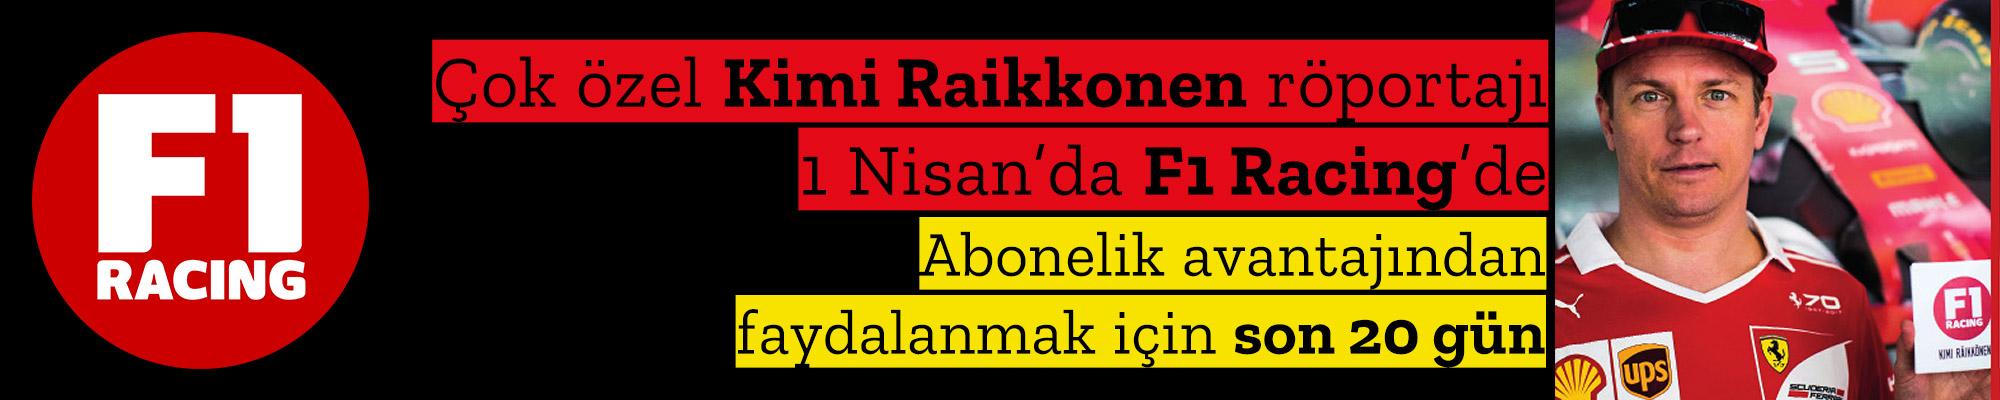 F1Racing-Turkiye